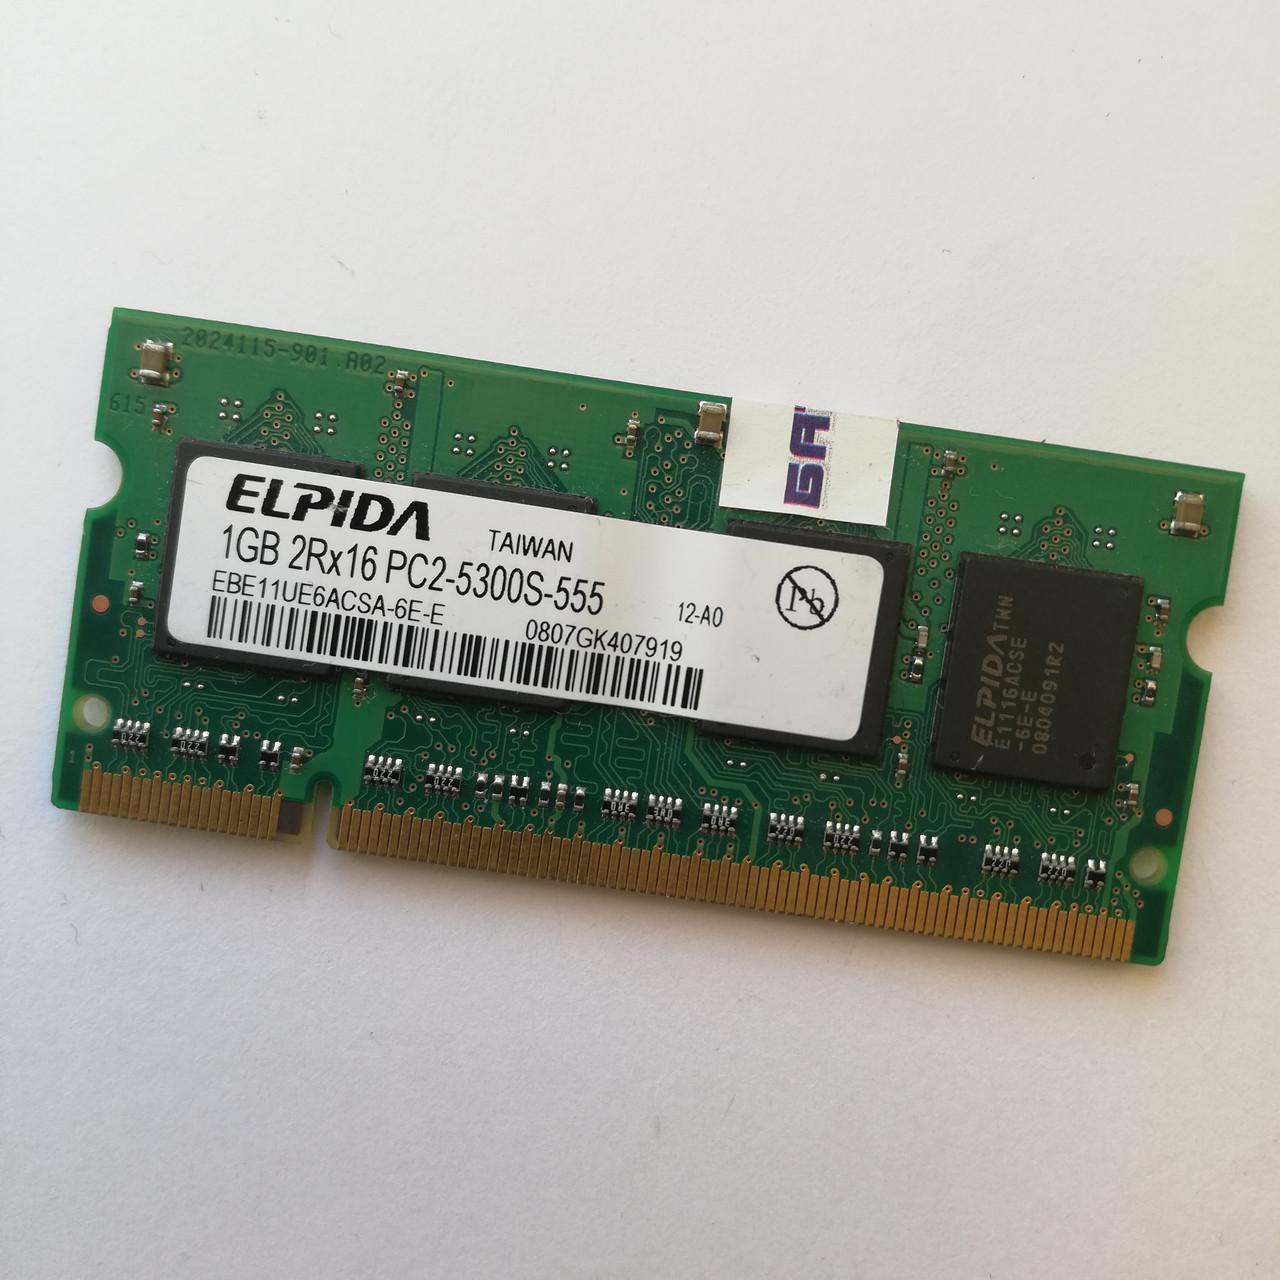 Оперативная память для ноутбука MIX Hynix, Crucial, Ramaxel, Nanya, Kingston SODIMM DDR2 1GB 667MHz 5300s Б/У